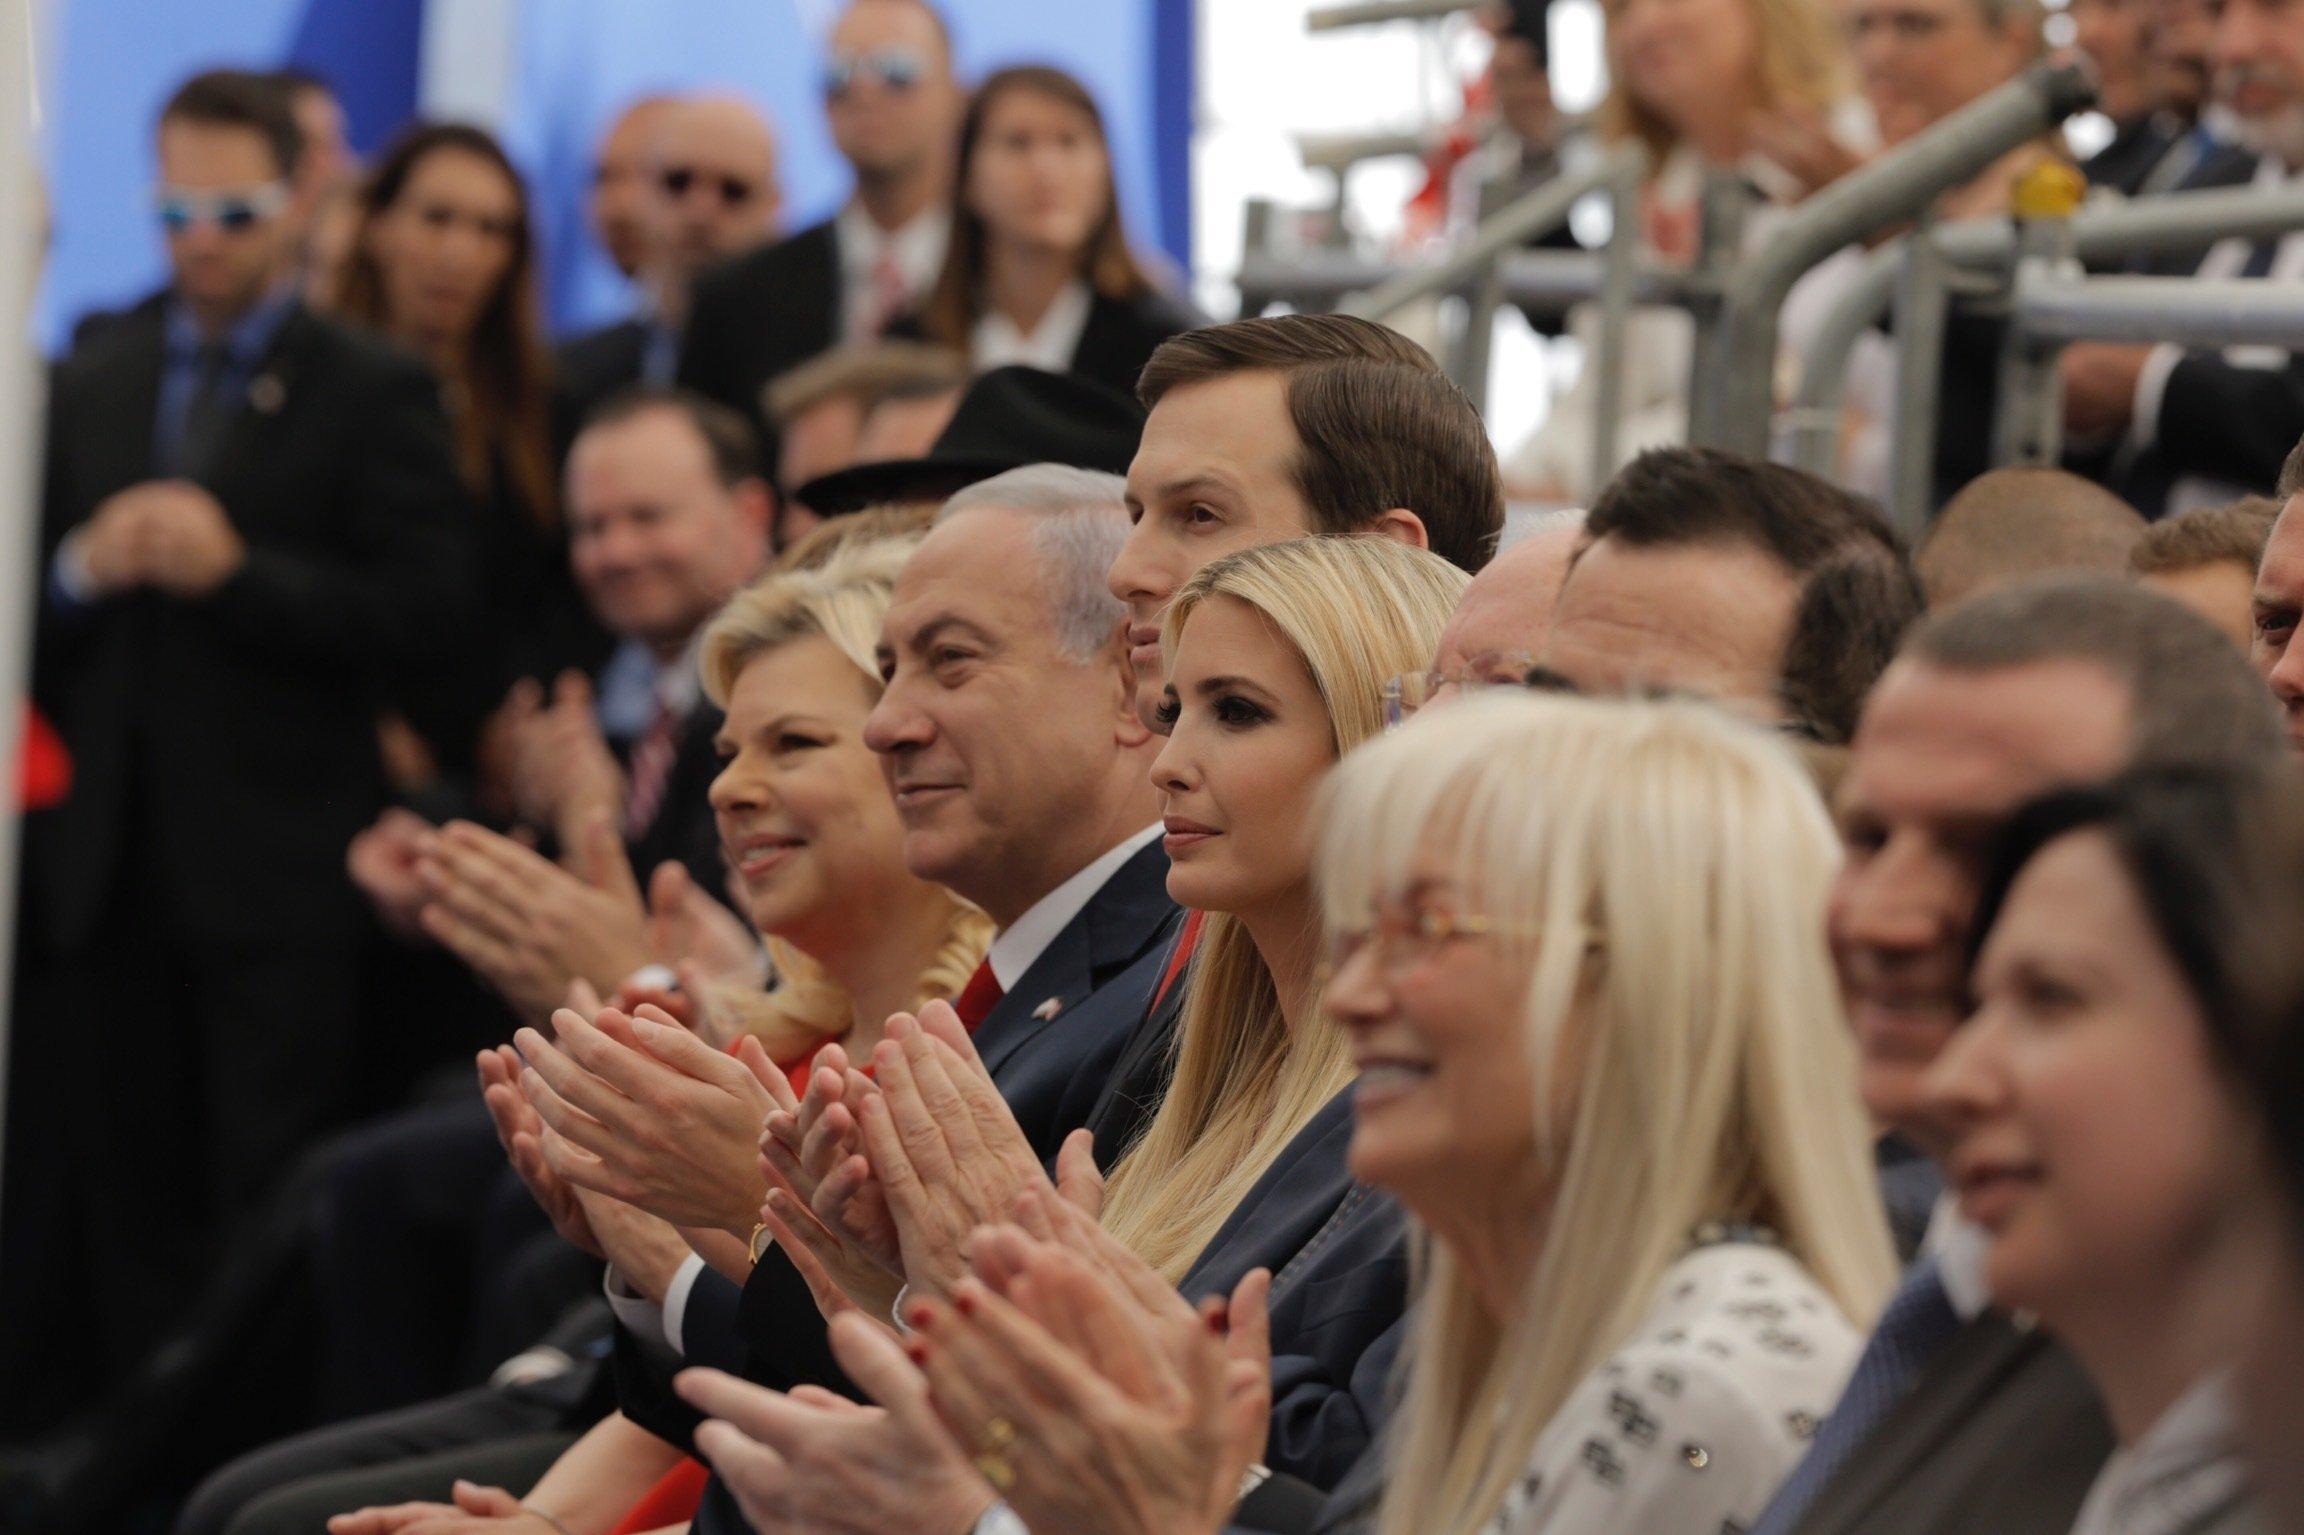 Israel's Prime Minister Benjamin Netanyahu, 2nd left, his wife Sara Netanyahu, left, Senior White House Advisor Jared Kushner, 3rd left, US President's daughter Ivanka Trump, center, US Treasury Secretary Steve Mnuchin, attend the opening ceremony of the new U.S. embassy in Jerusalem, Monday, May 14, 2018